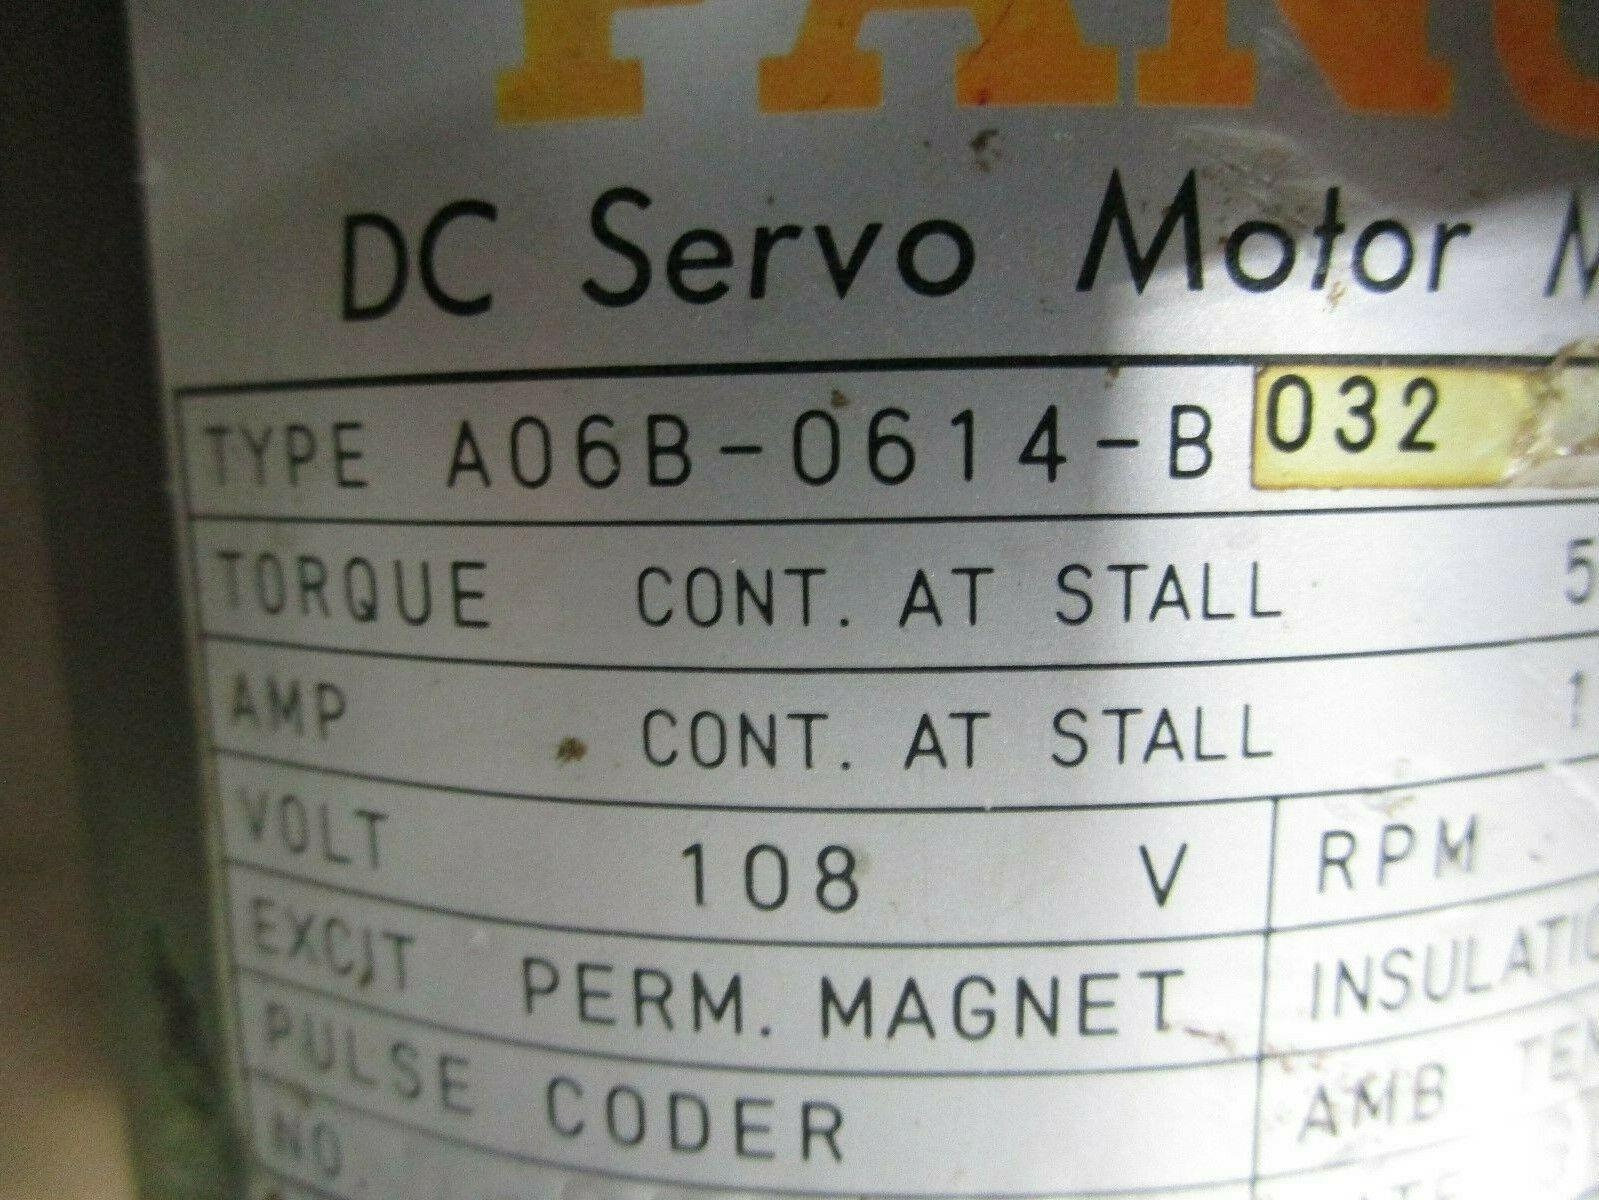 Fanuc DC Servo Motor A06B-0614-B032